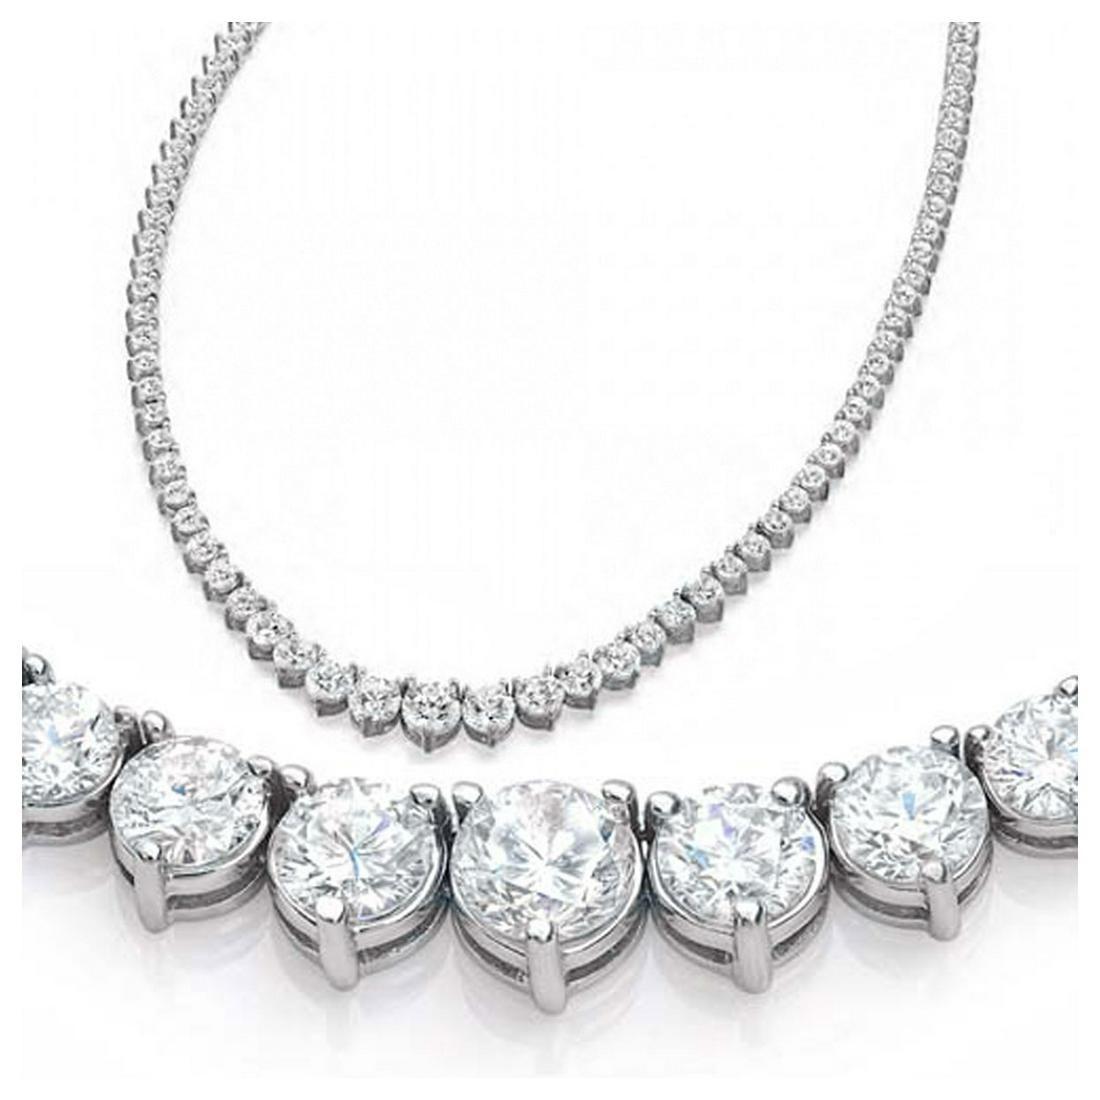 Natural 960CTW VS2IJ Diamond Tennis Necklace 18K